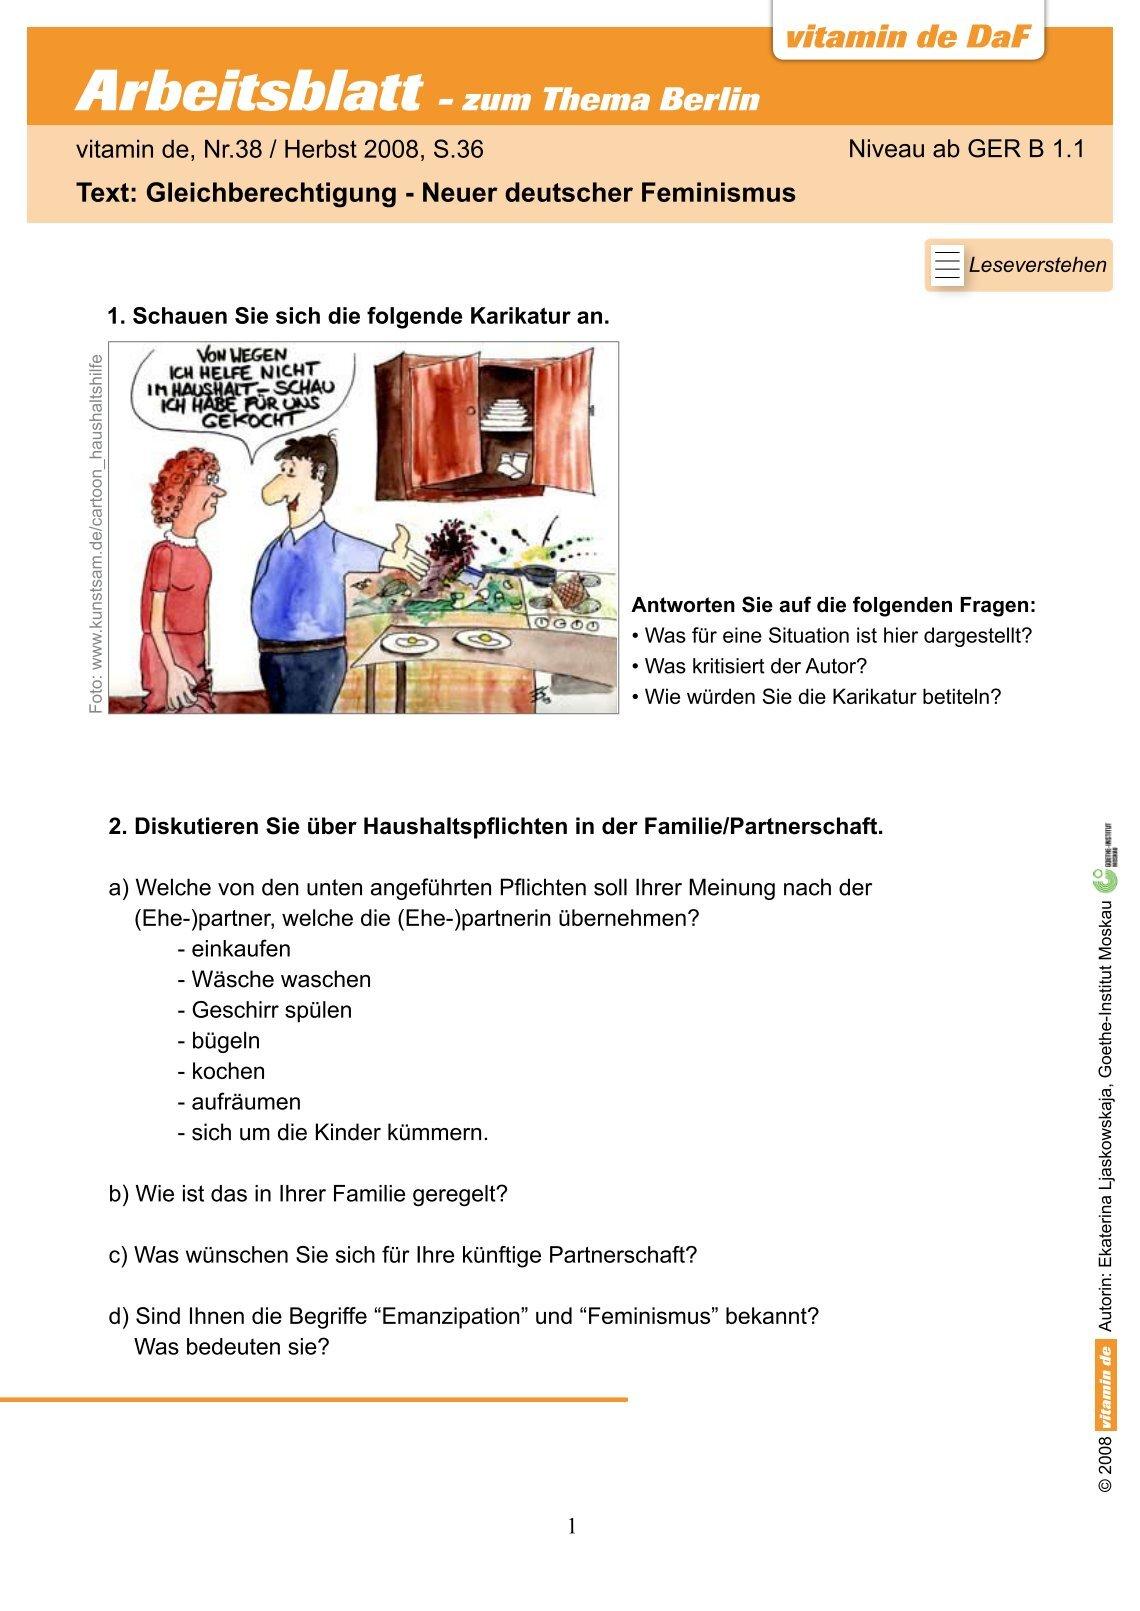 Beste Beachten Sie Arbeitsblatt Plattentektonik Antworten Unter ...